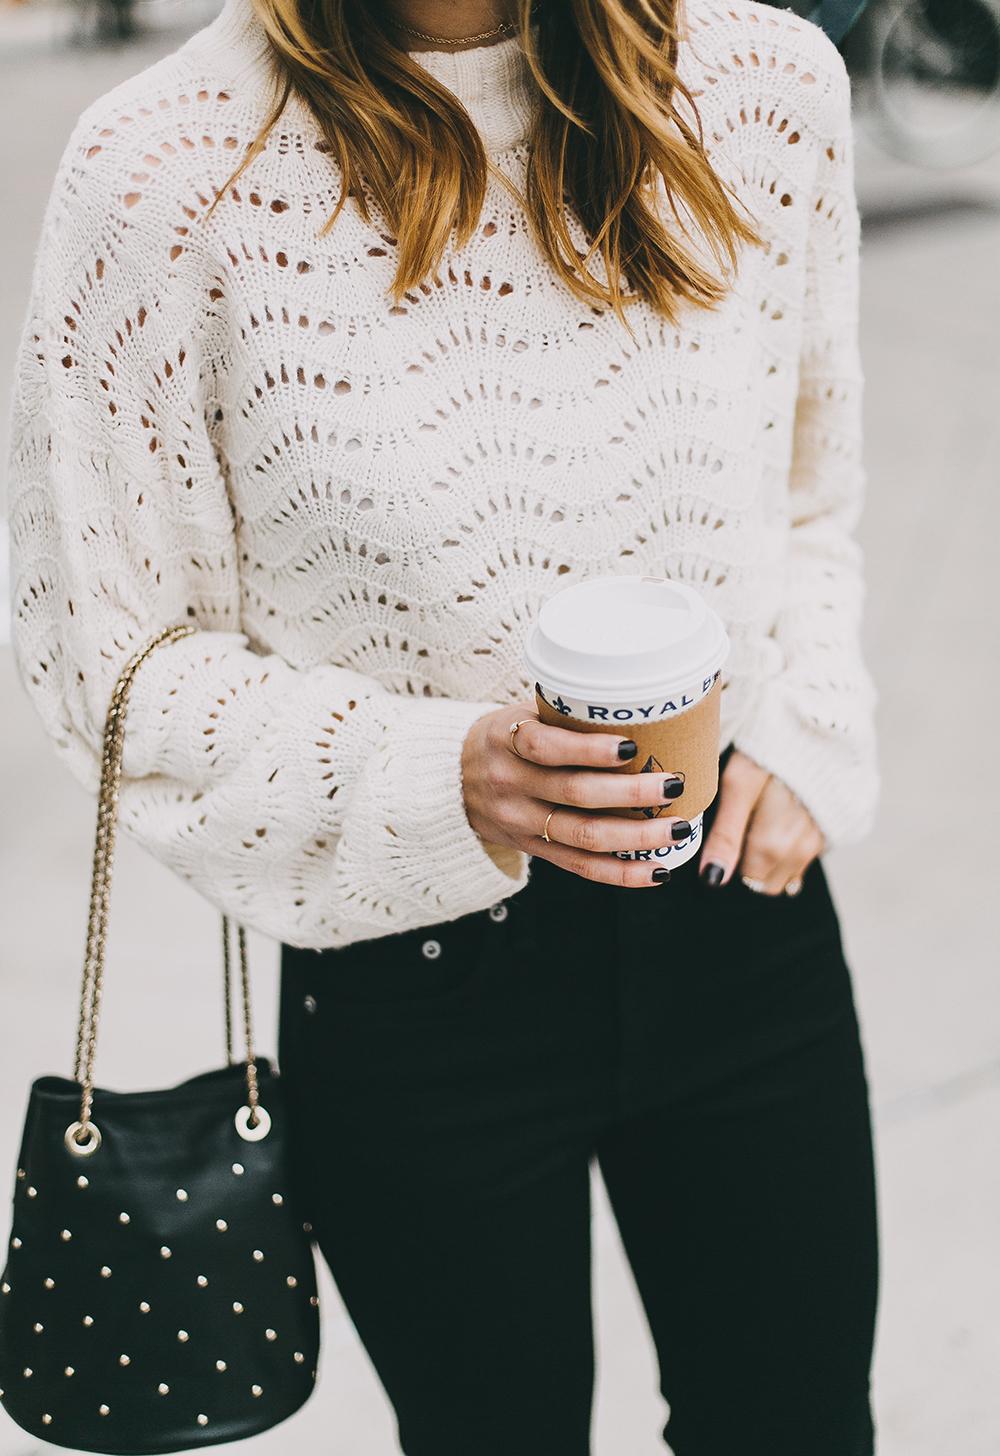 livvyland-blog-olivia-watson-austin-texas-fashion-blogger-white-knit-sweater-rag-bone-crop-flare-black-jeans-gucci-loafers-2